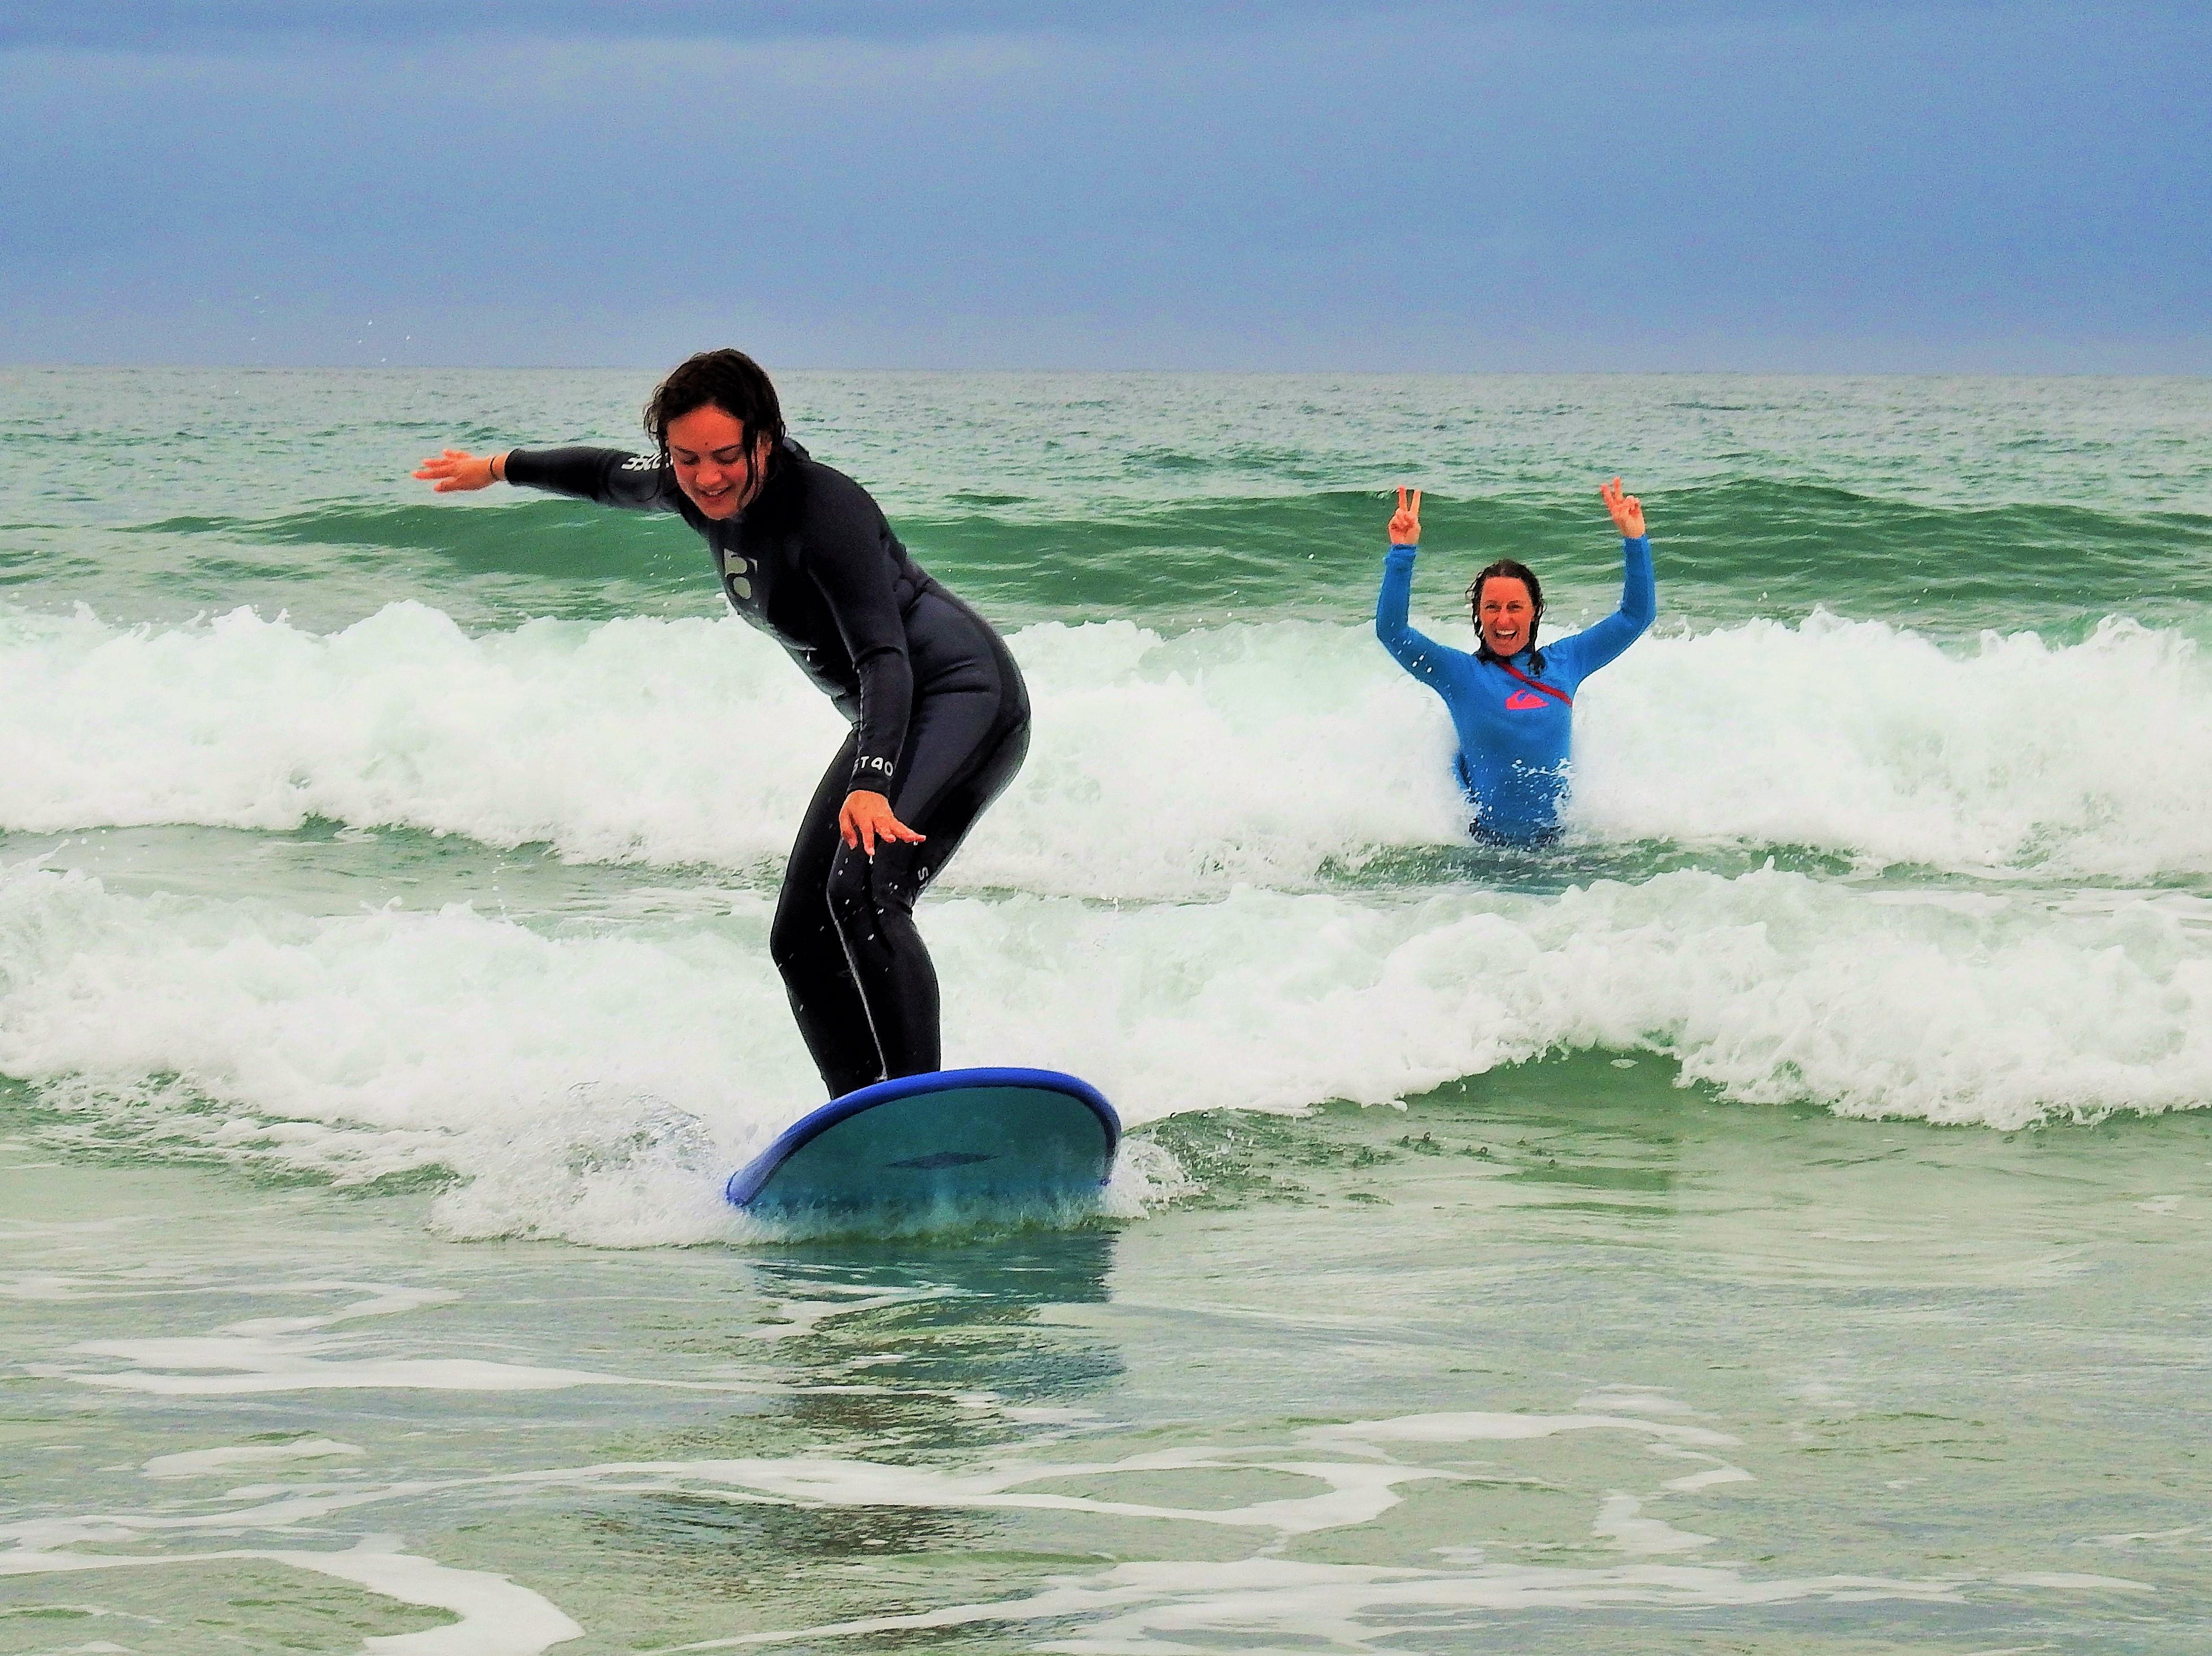 for ledis helth surf